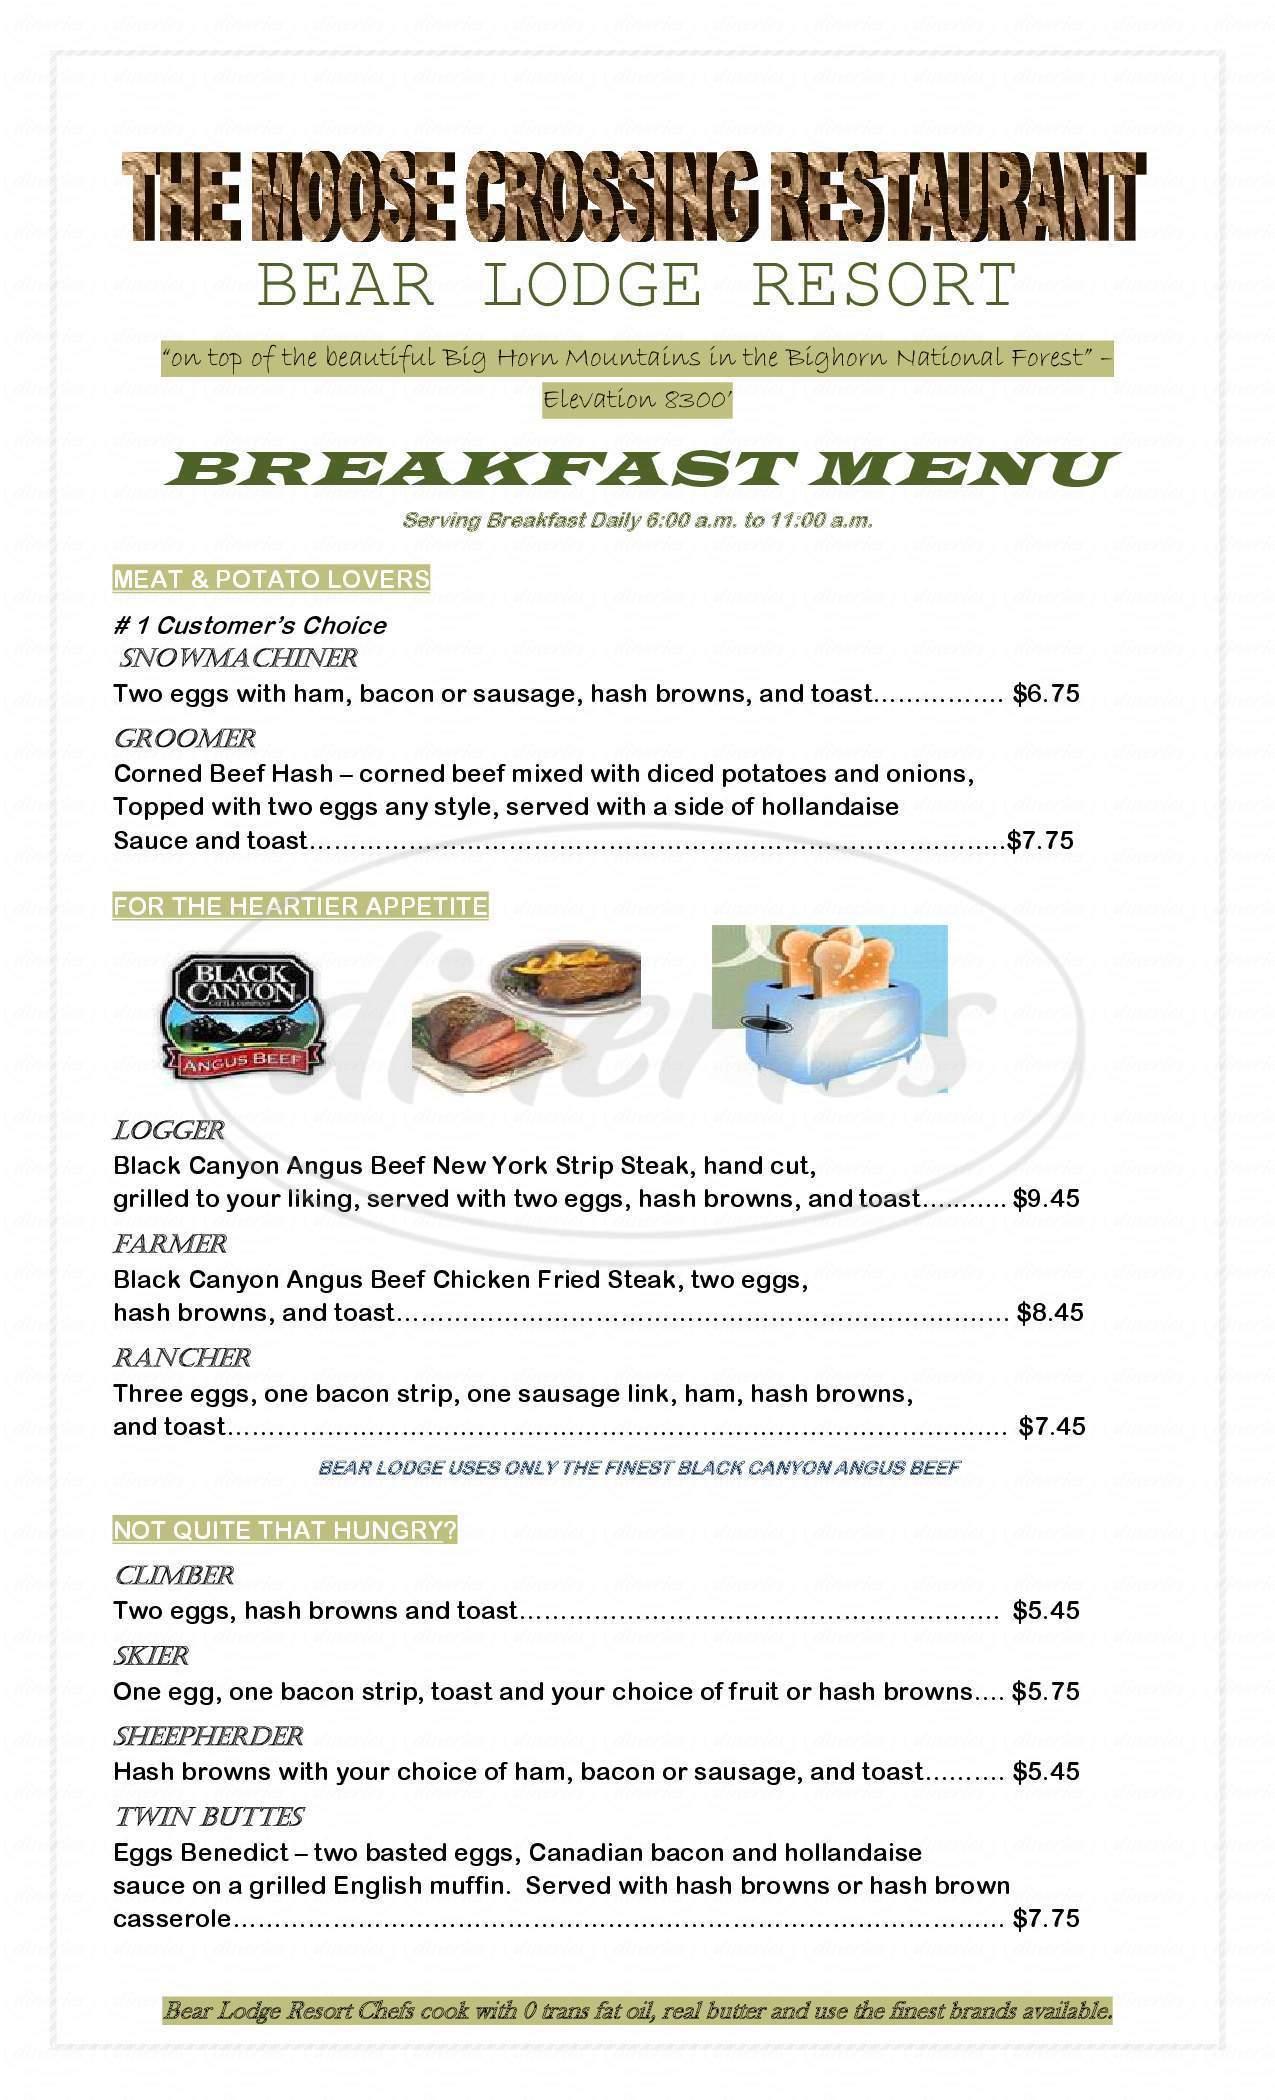 menu for Bear Lodge Resort, Big Horn Mountains